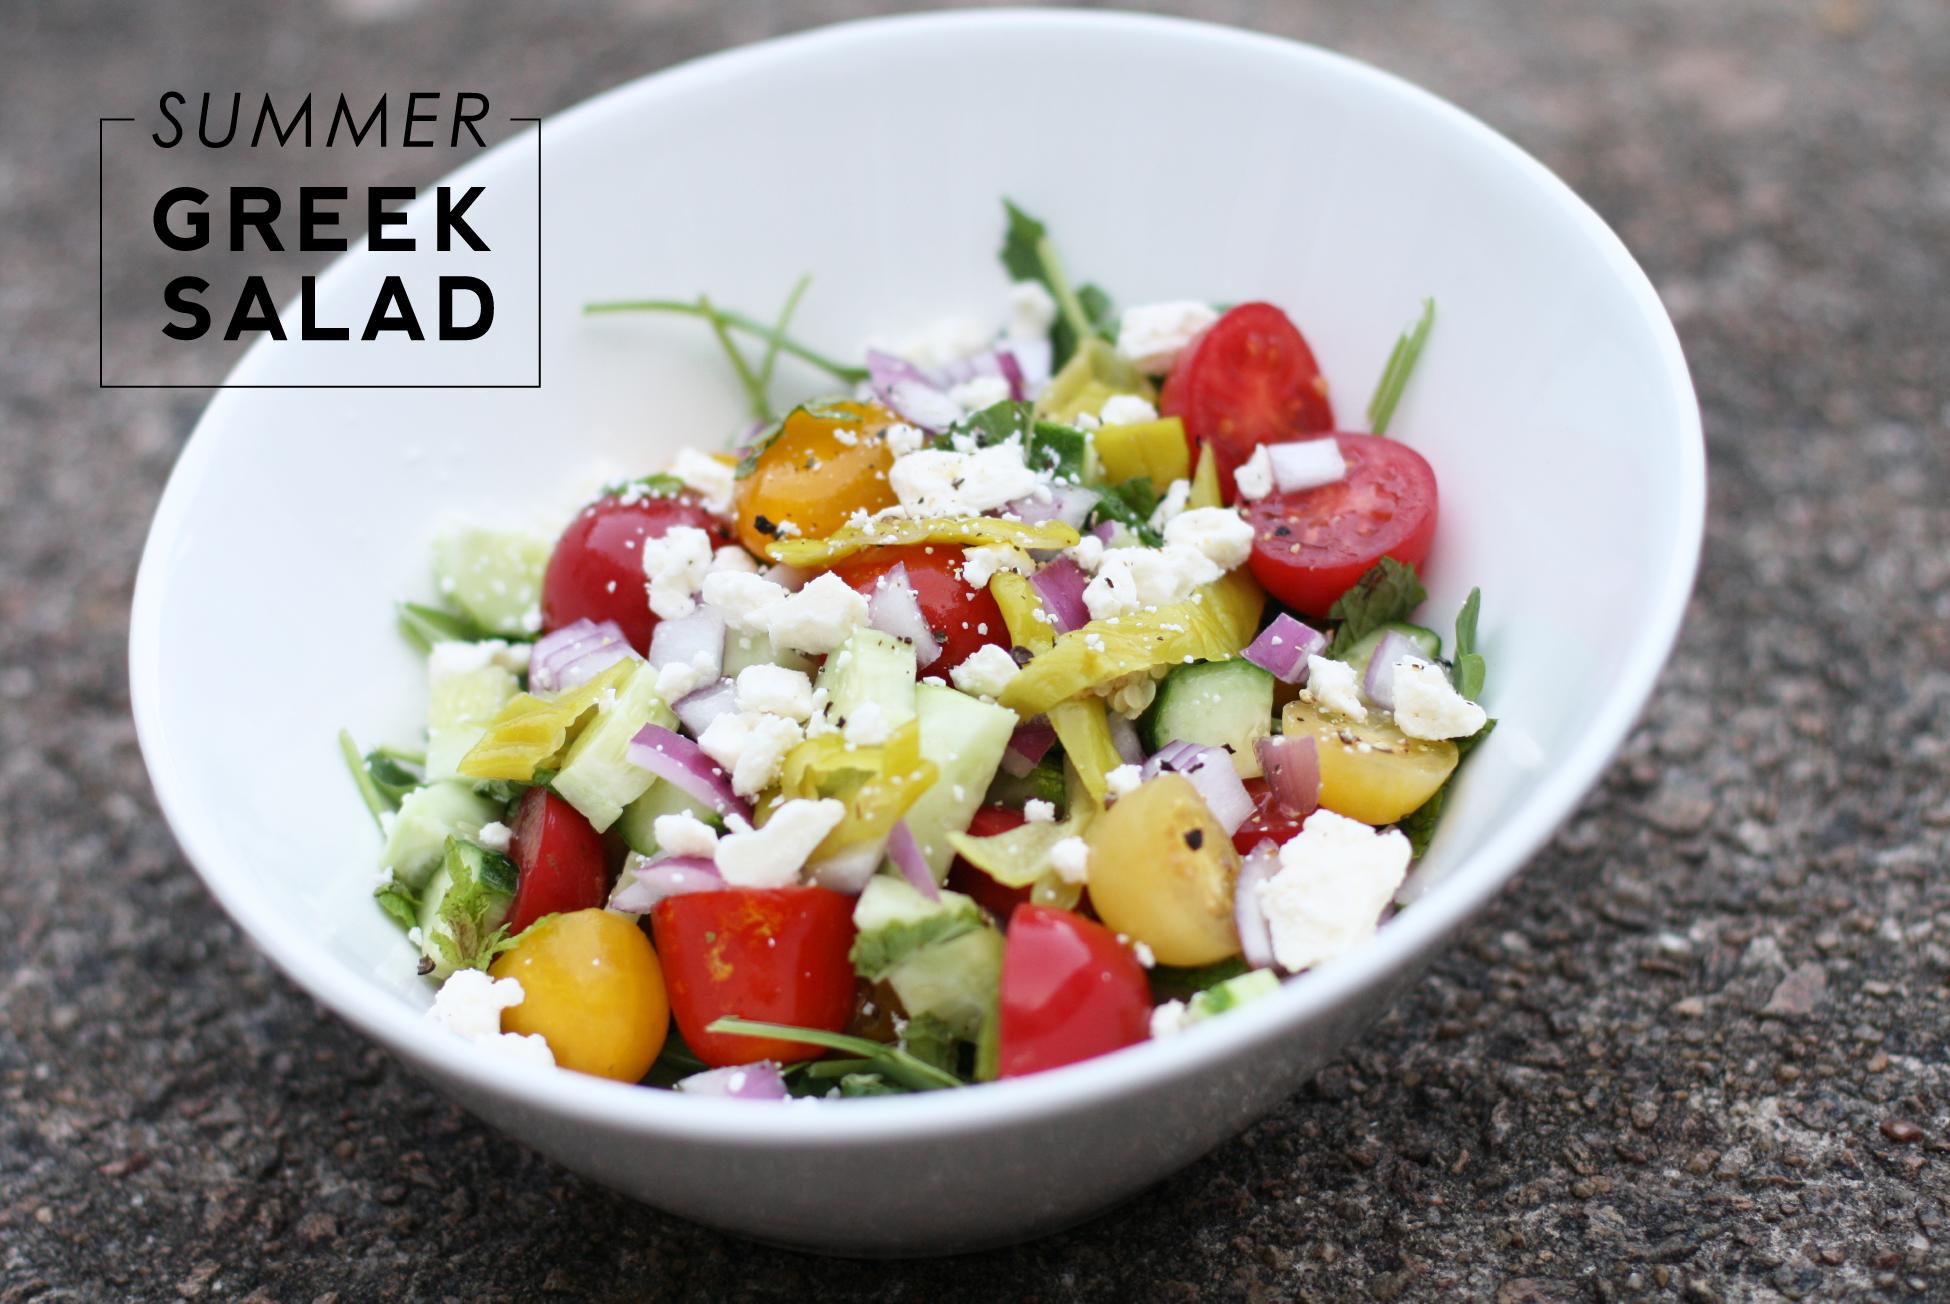 summer-greek-salad-intro